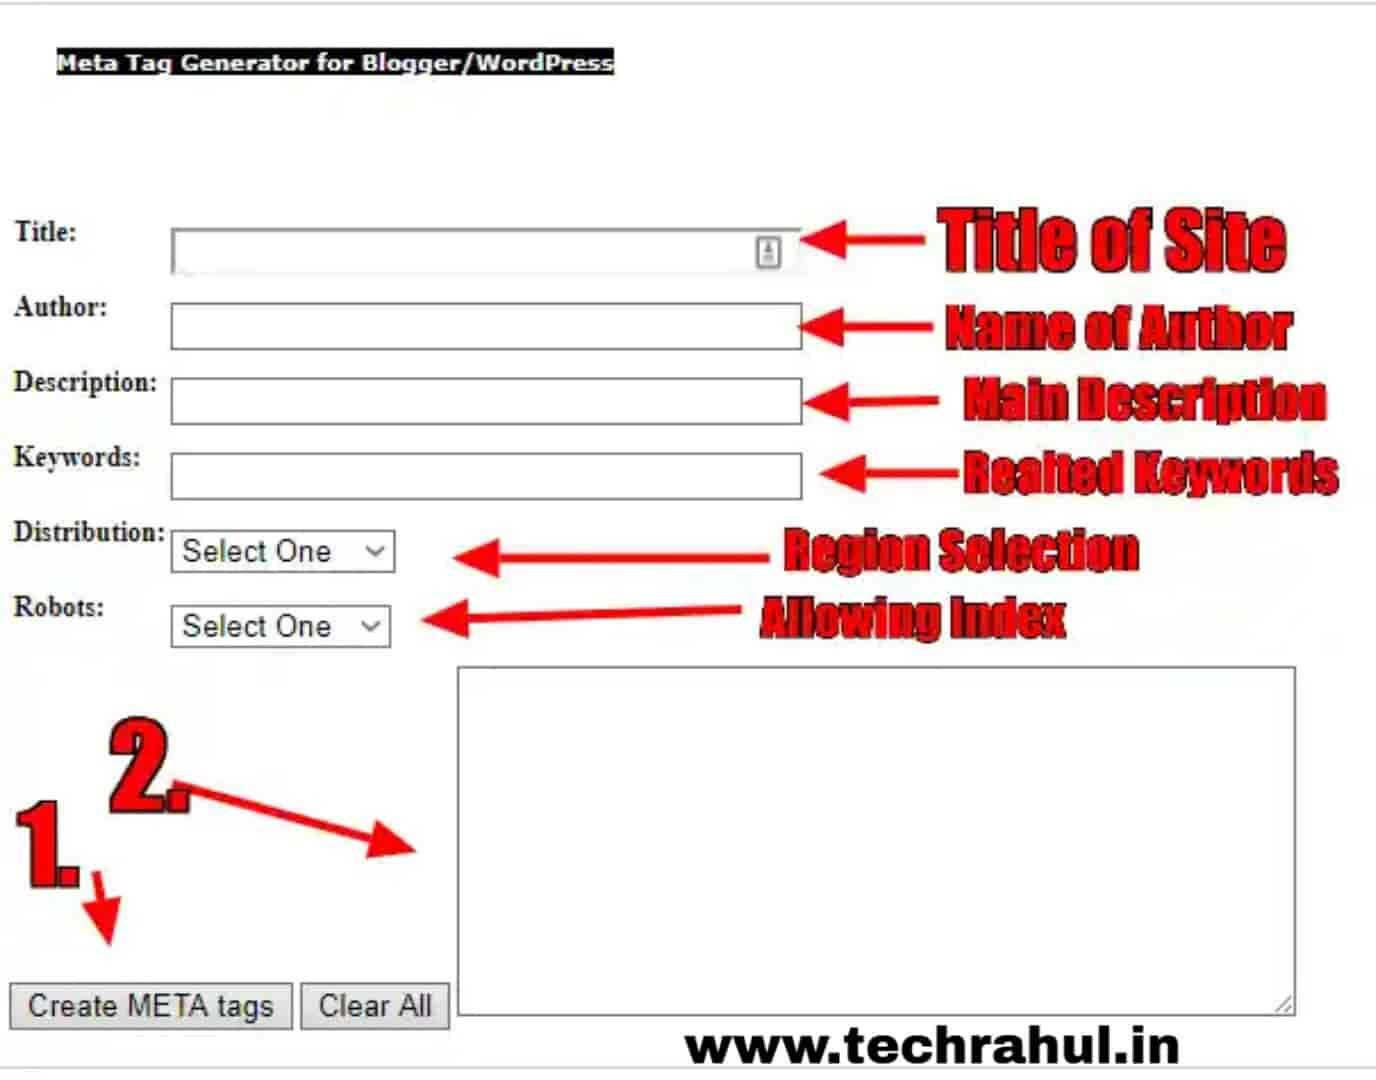 Meta Tag Generator for Google Blogger